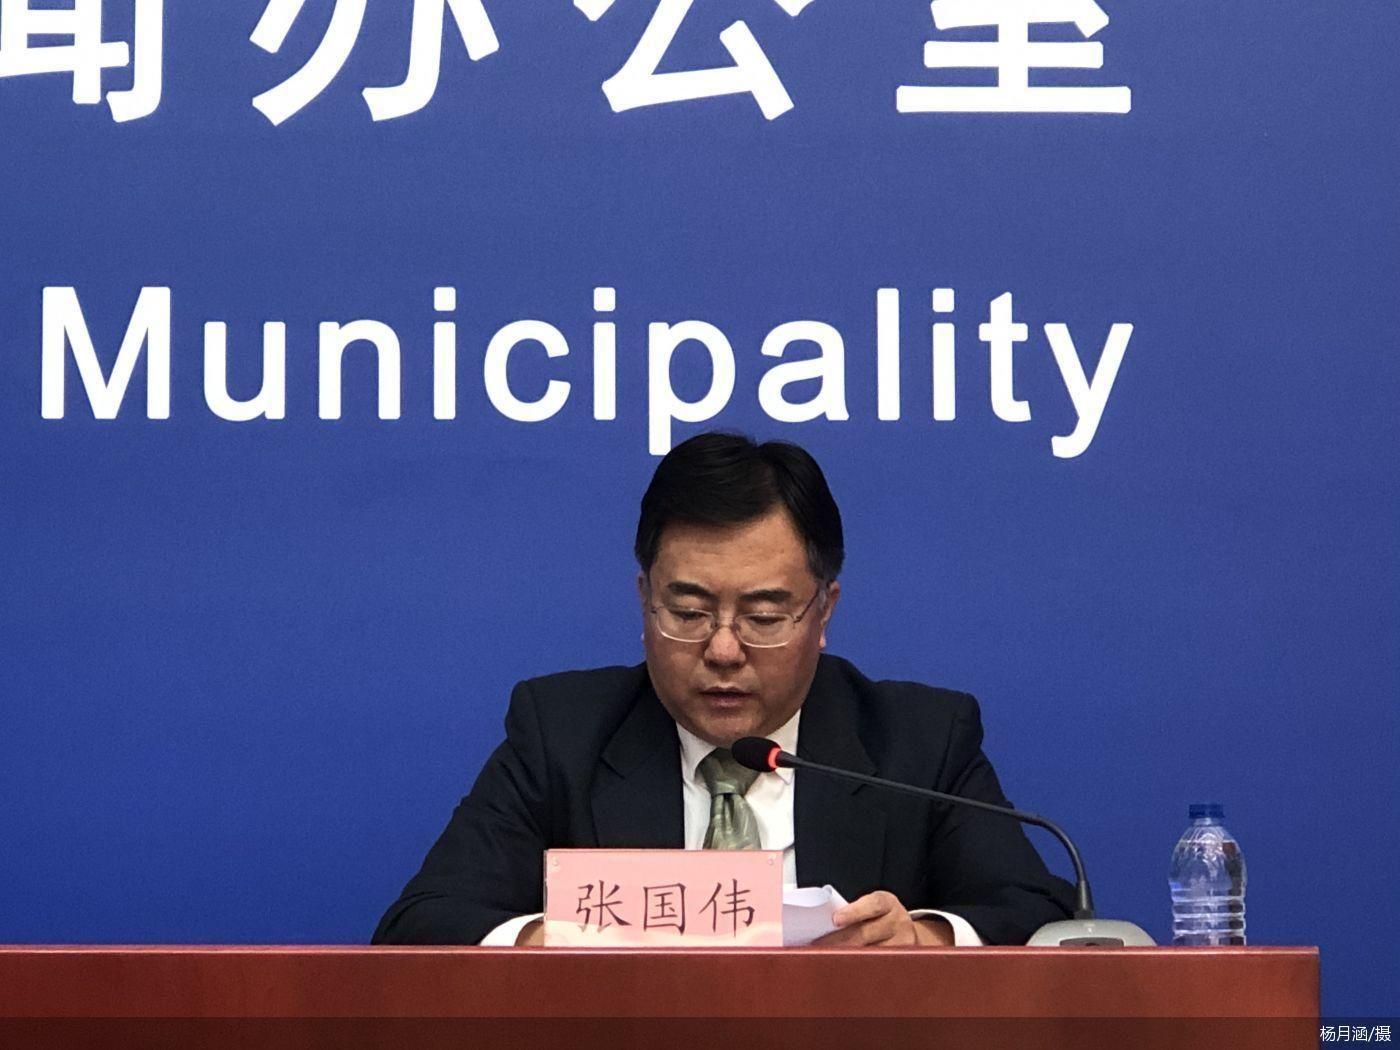 usdt第三方支付(caibao.it):北京明年将供应集租房5000套,解决新市民等过渡性需求 第1张